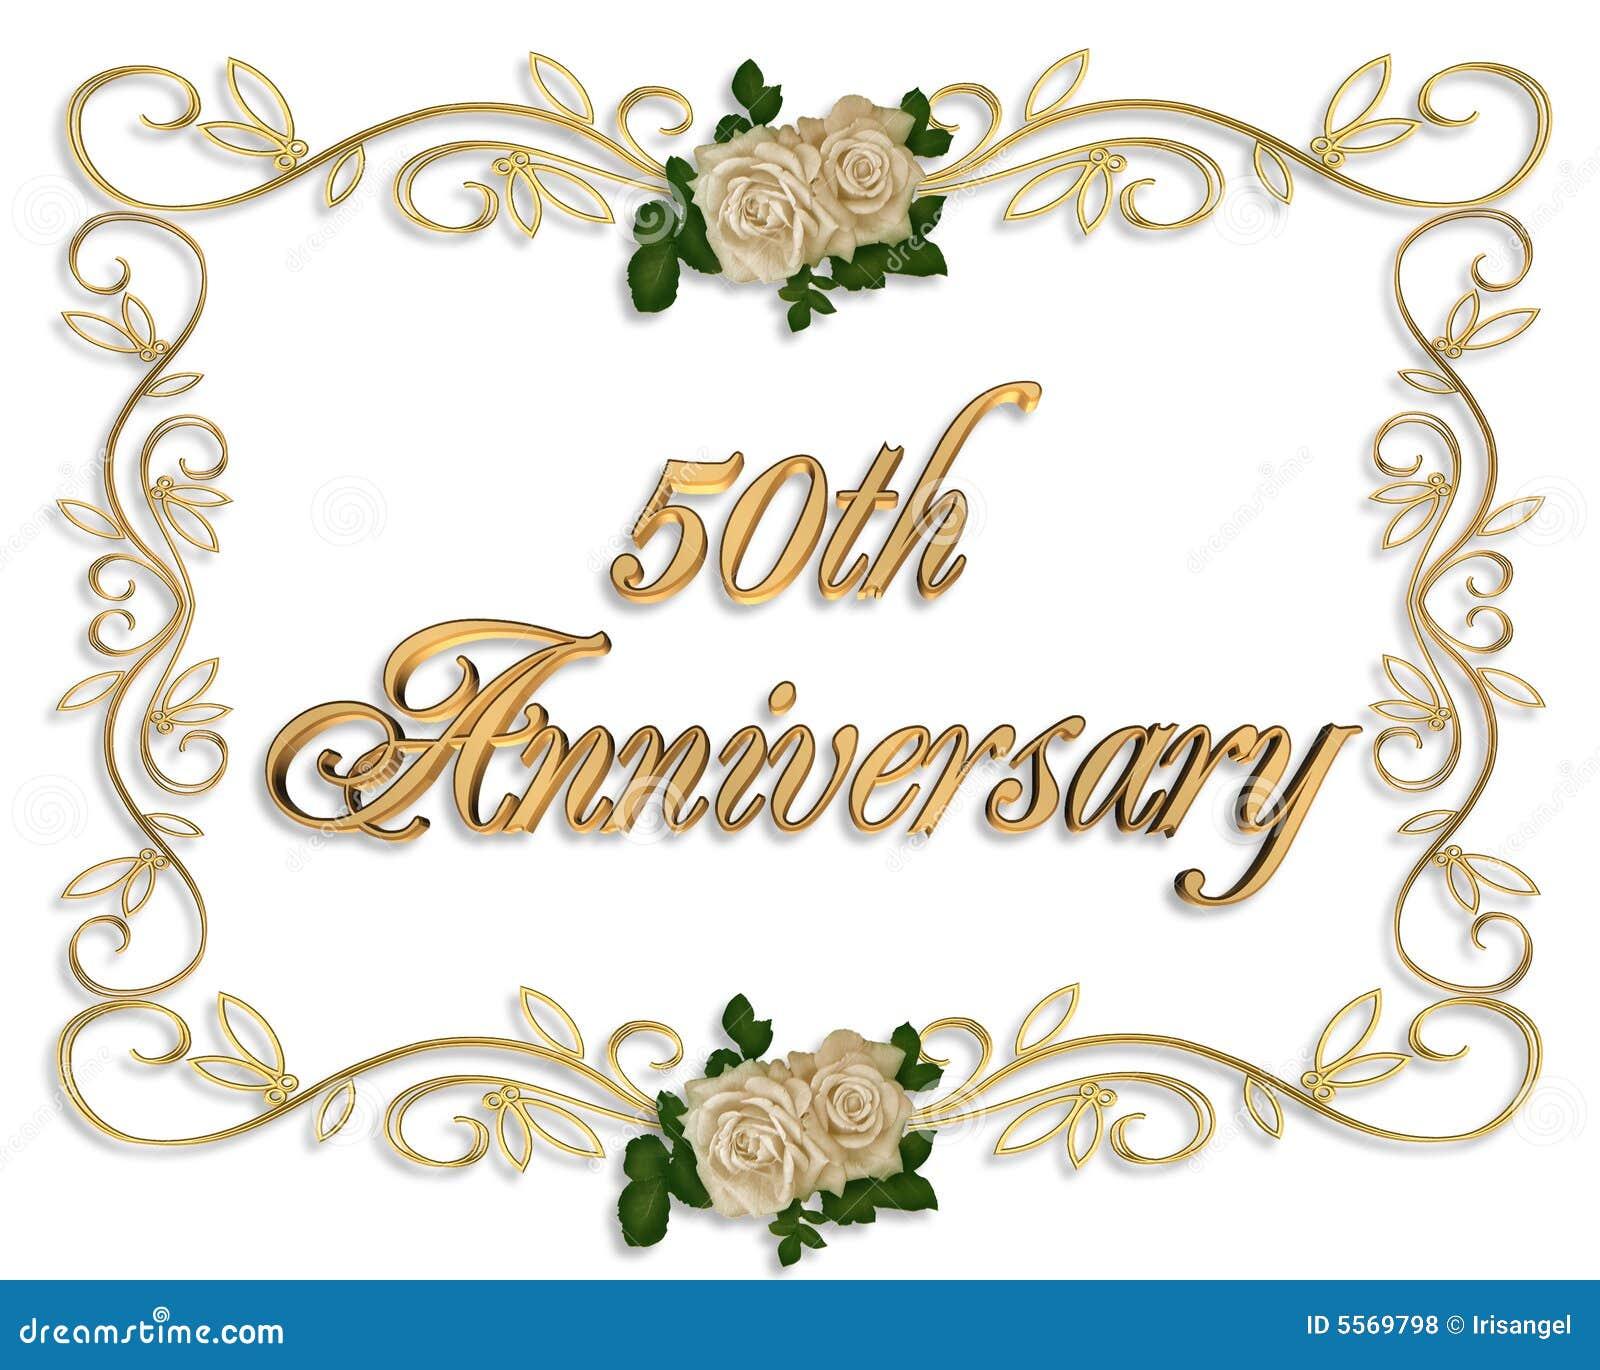 50th Anniversary Invitation Royalty Free Stock Photos - Image: 5569798